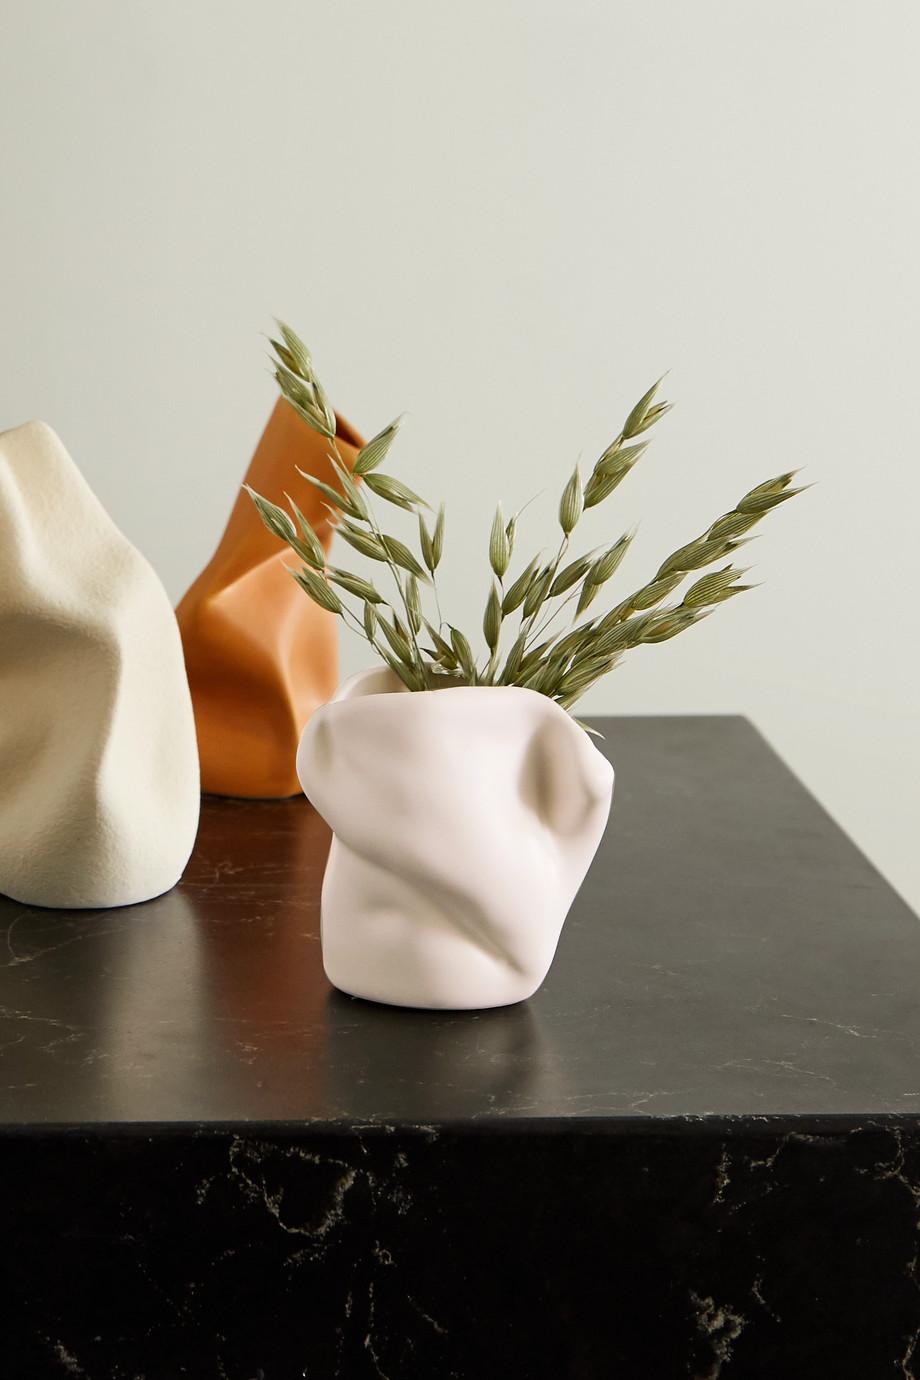 Completedworks + Ekaterina Bazhenova Yamasaki Postures small ceramic vase